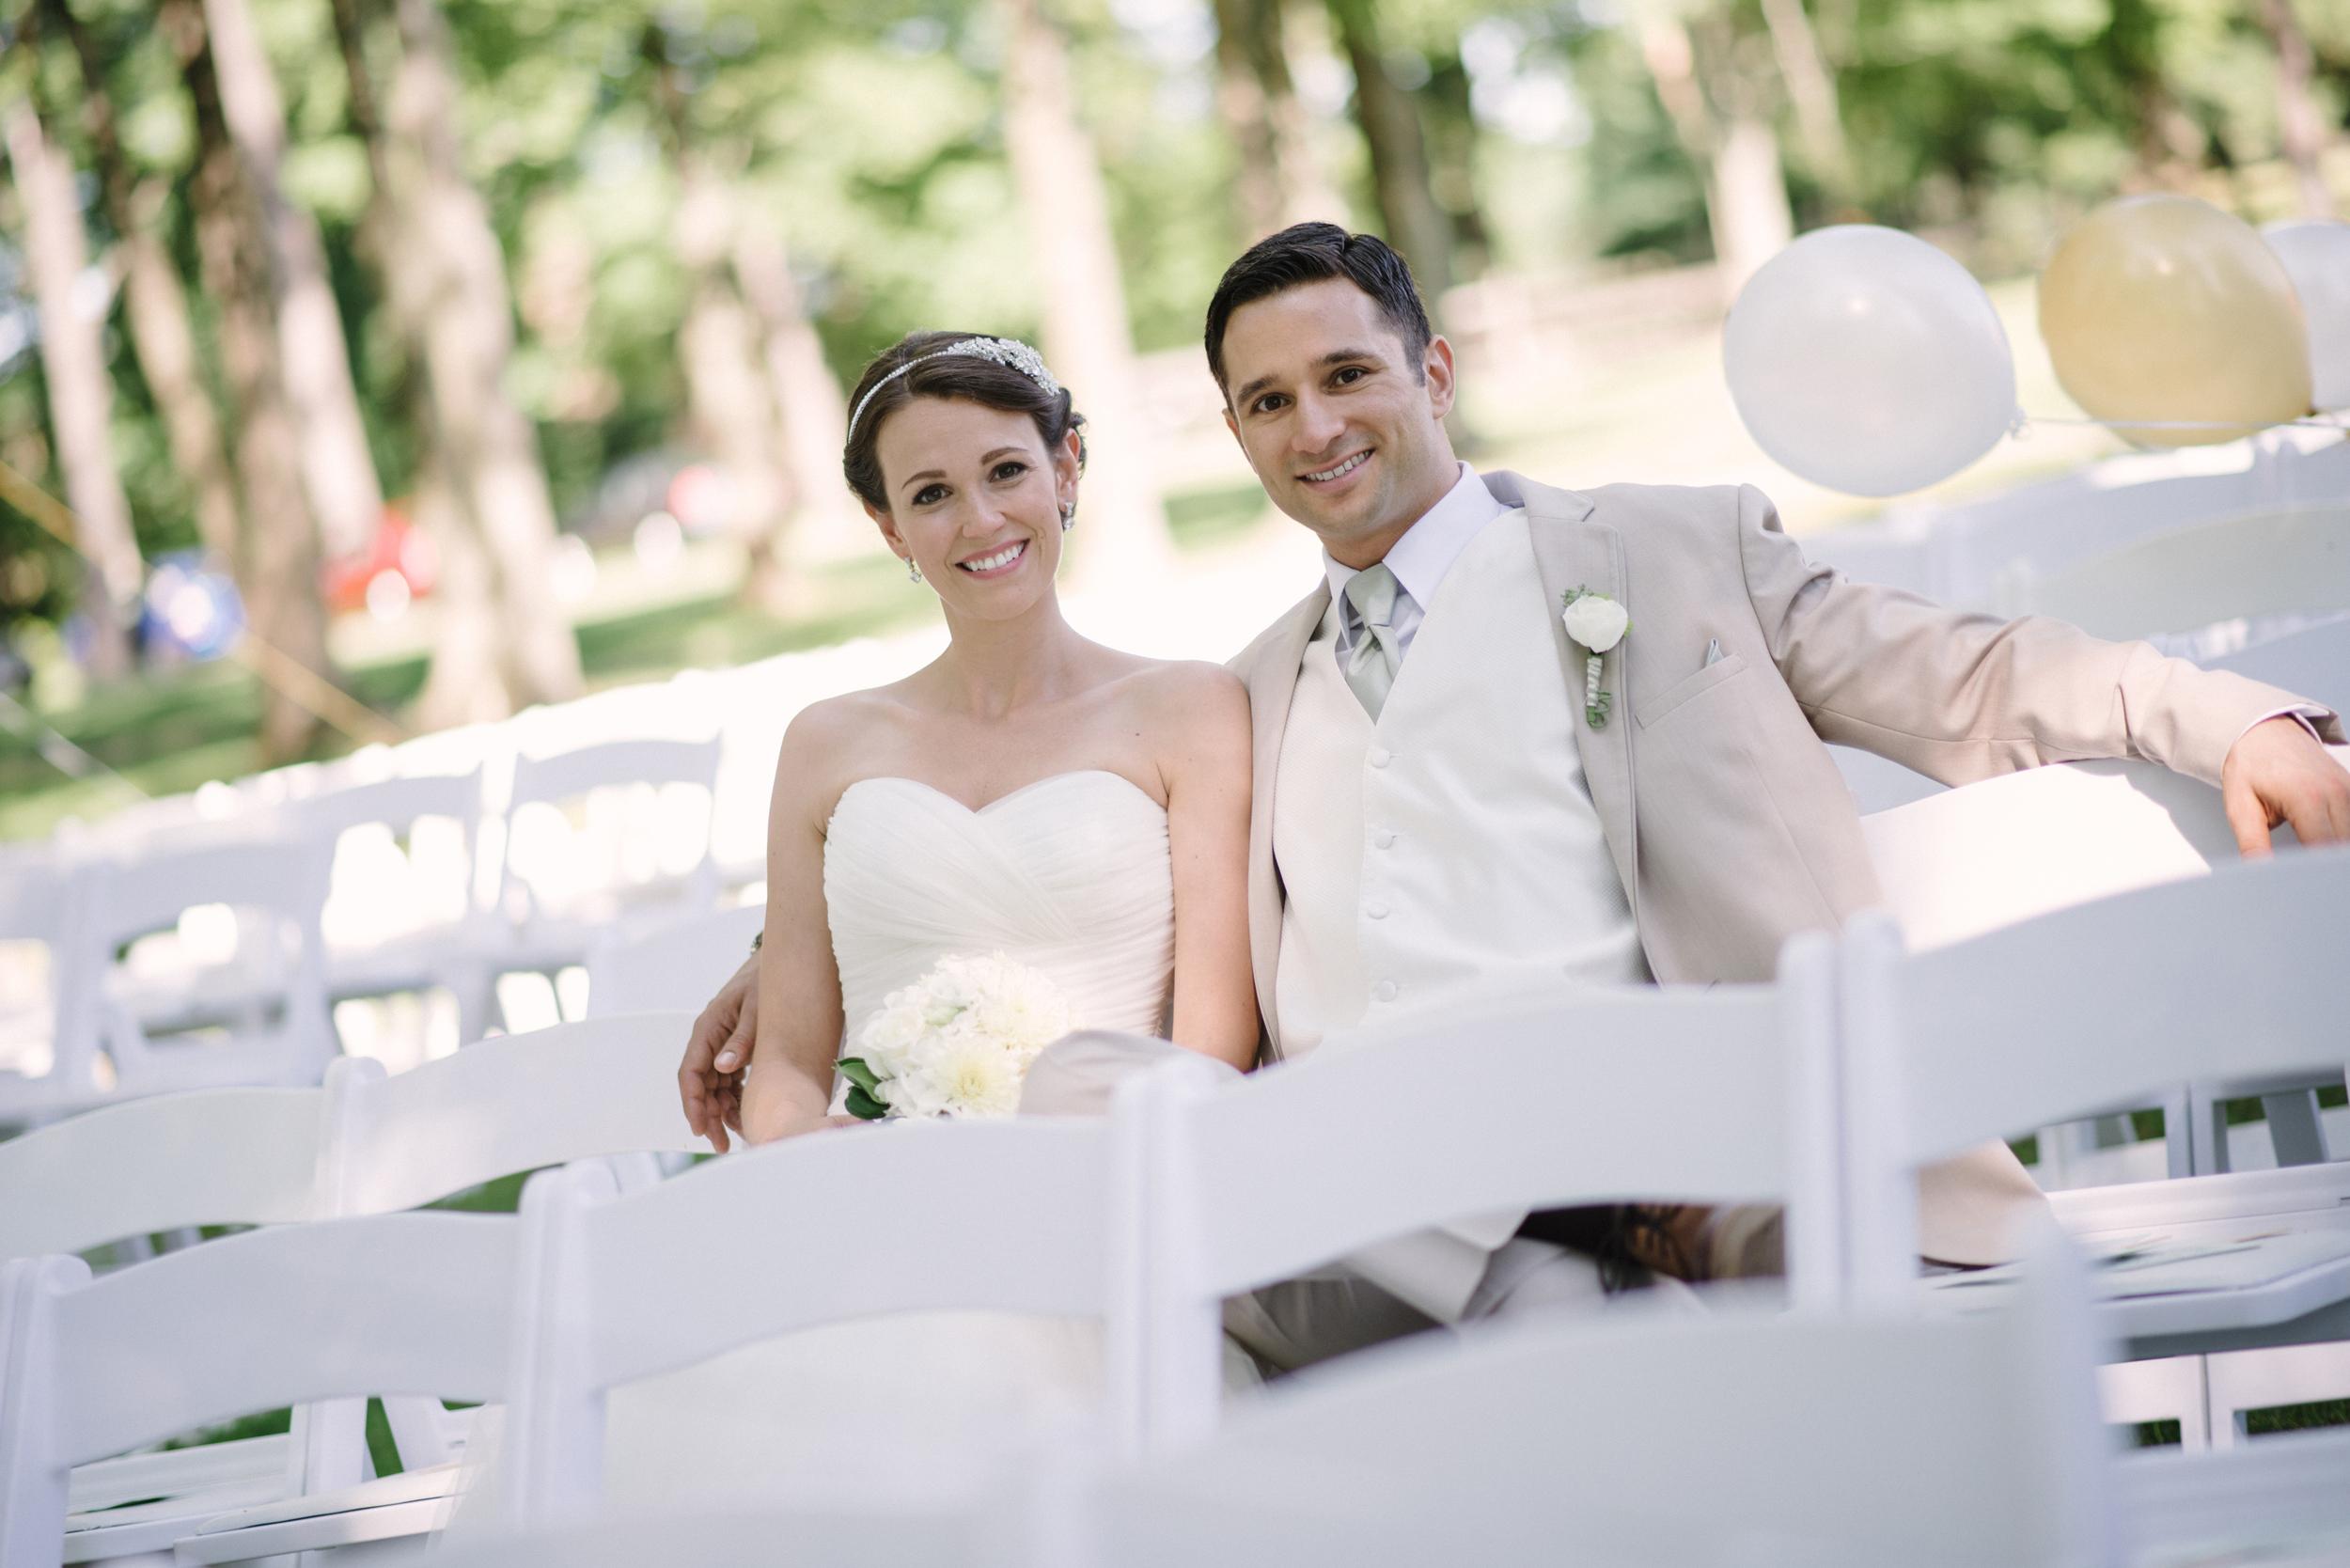 Matt_Swetel_Photography_Erin_and_Jeff_married030.jpg